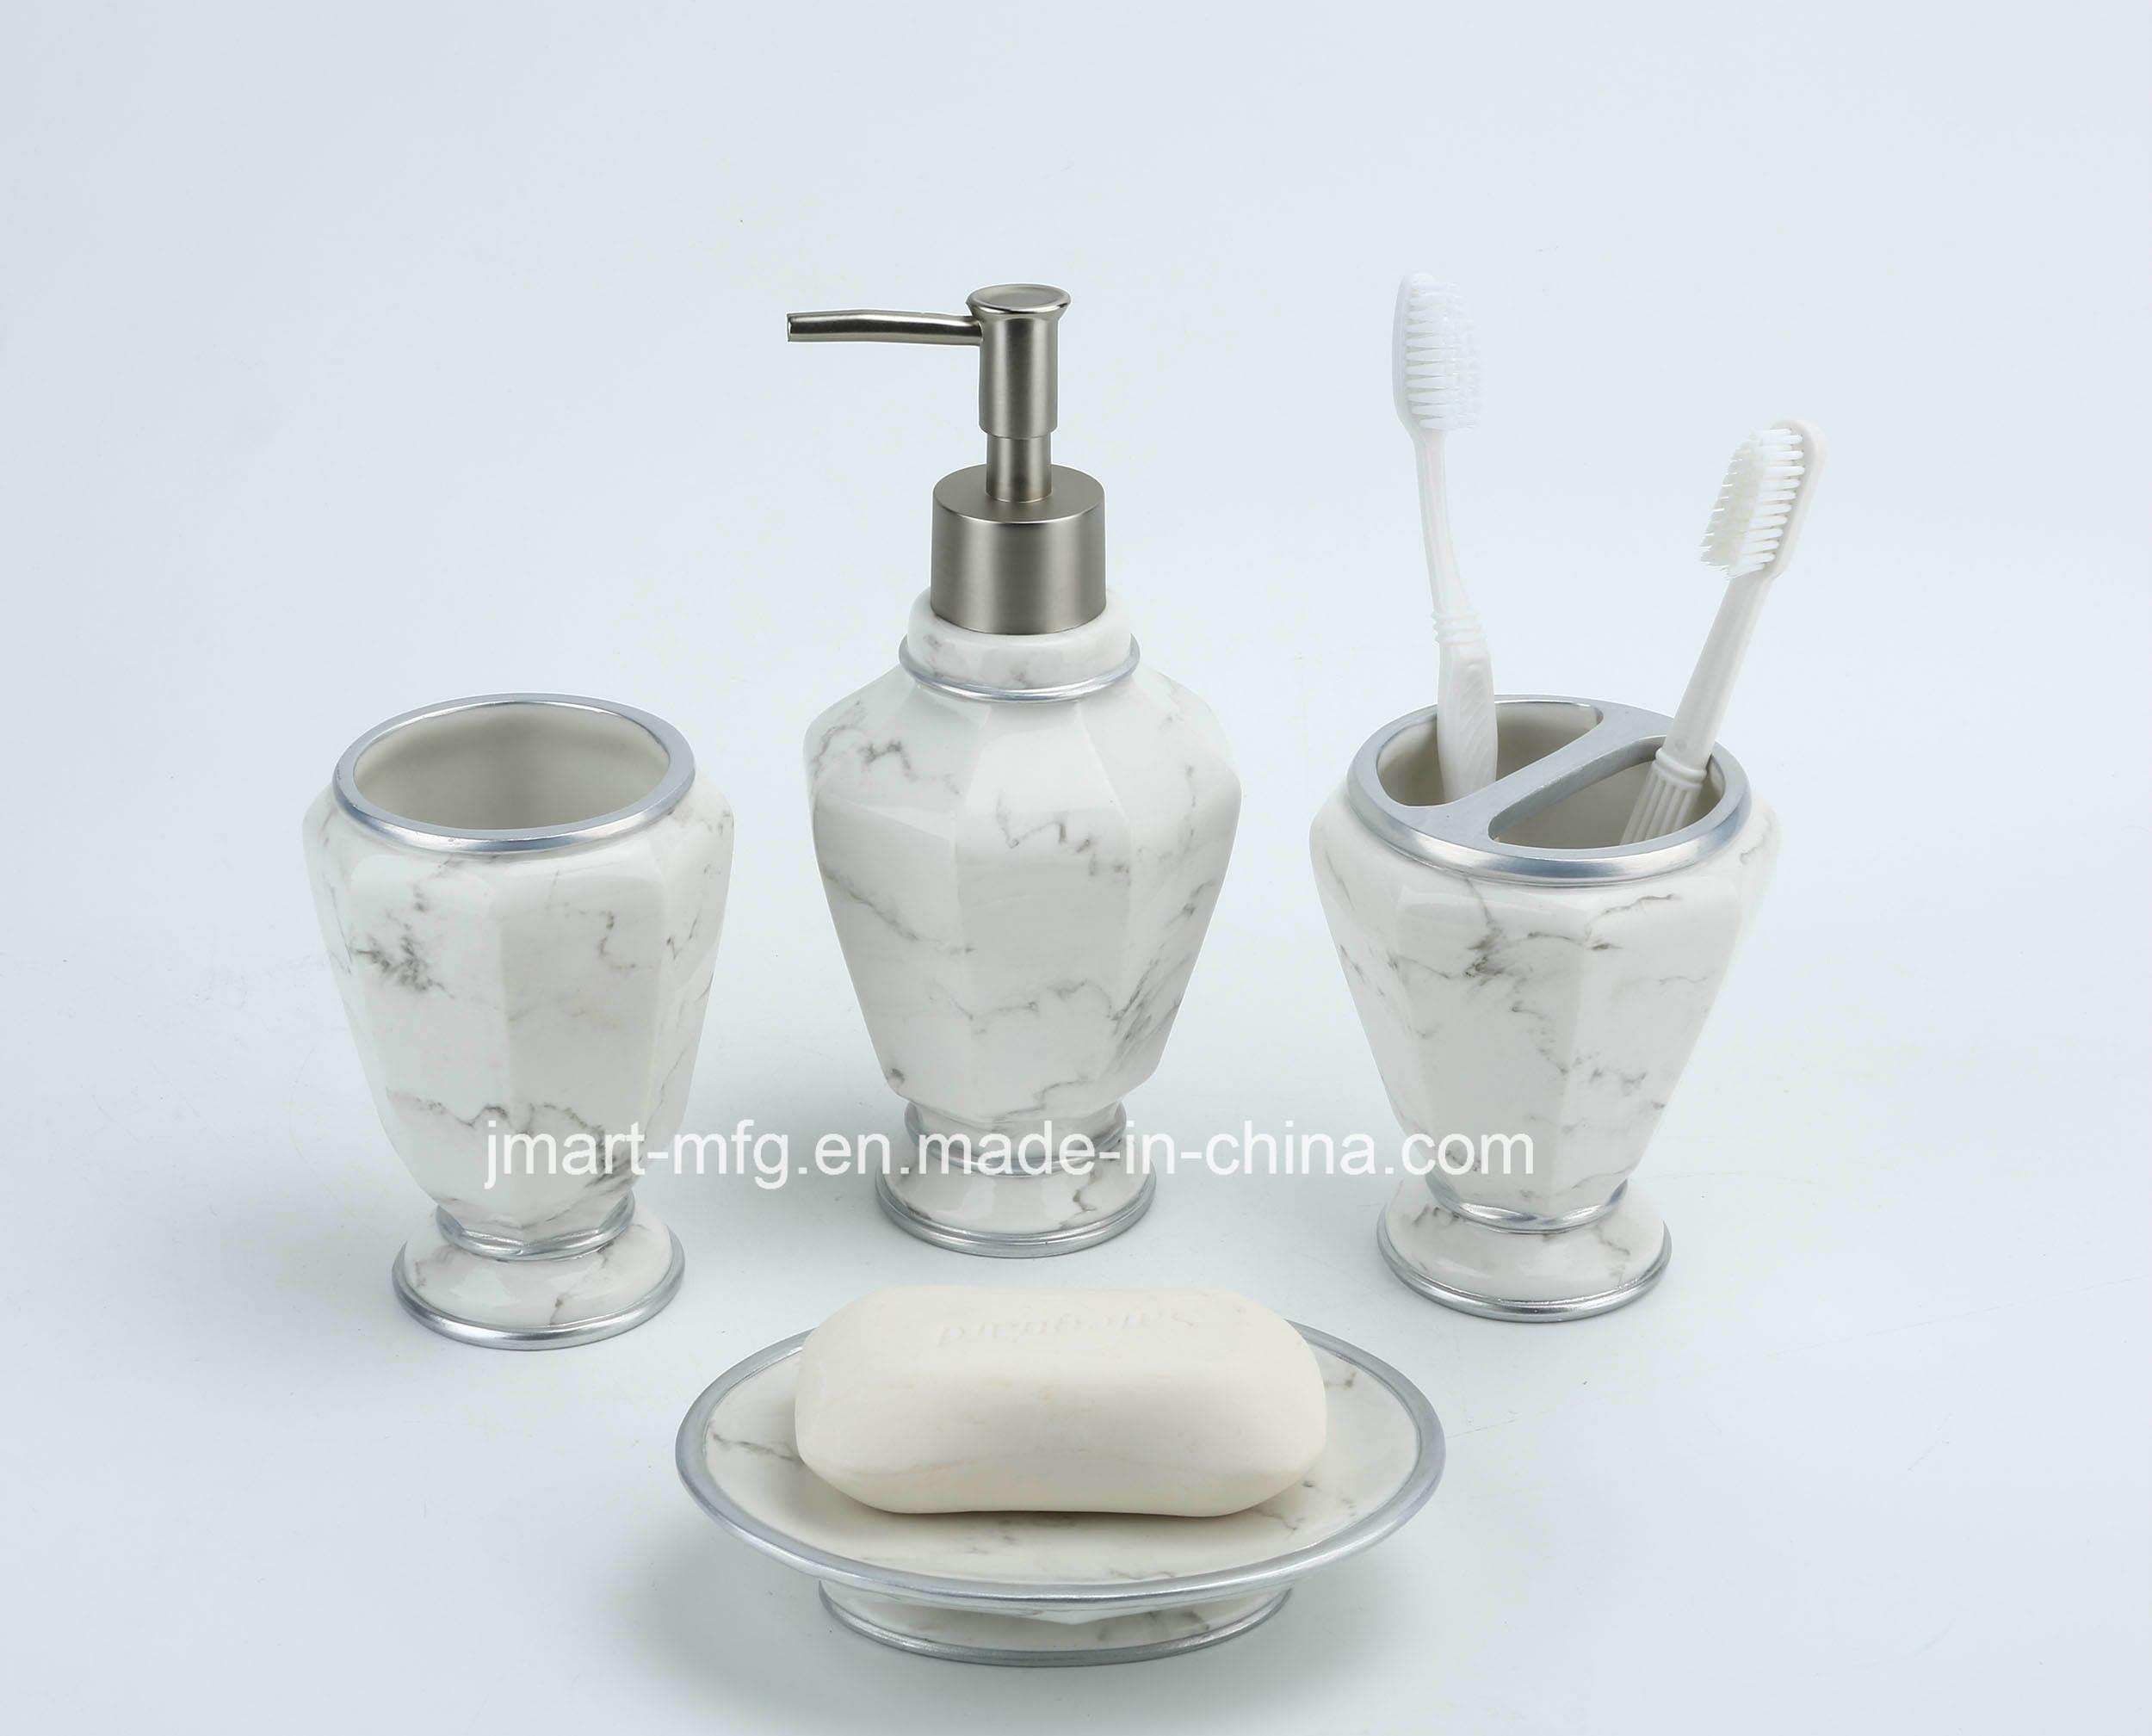 Marble Finish Polyresin Bathroom Accessory